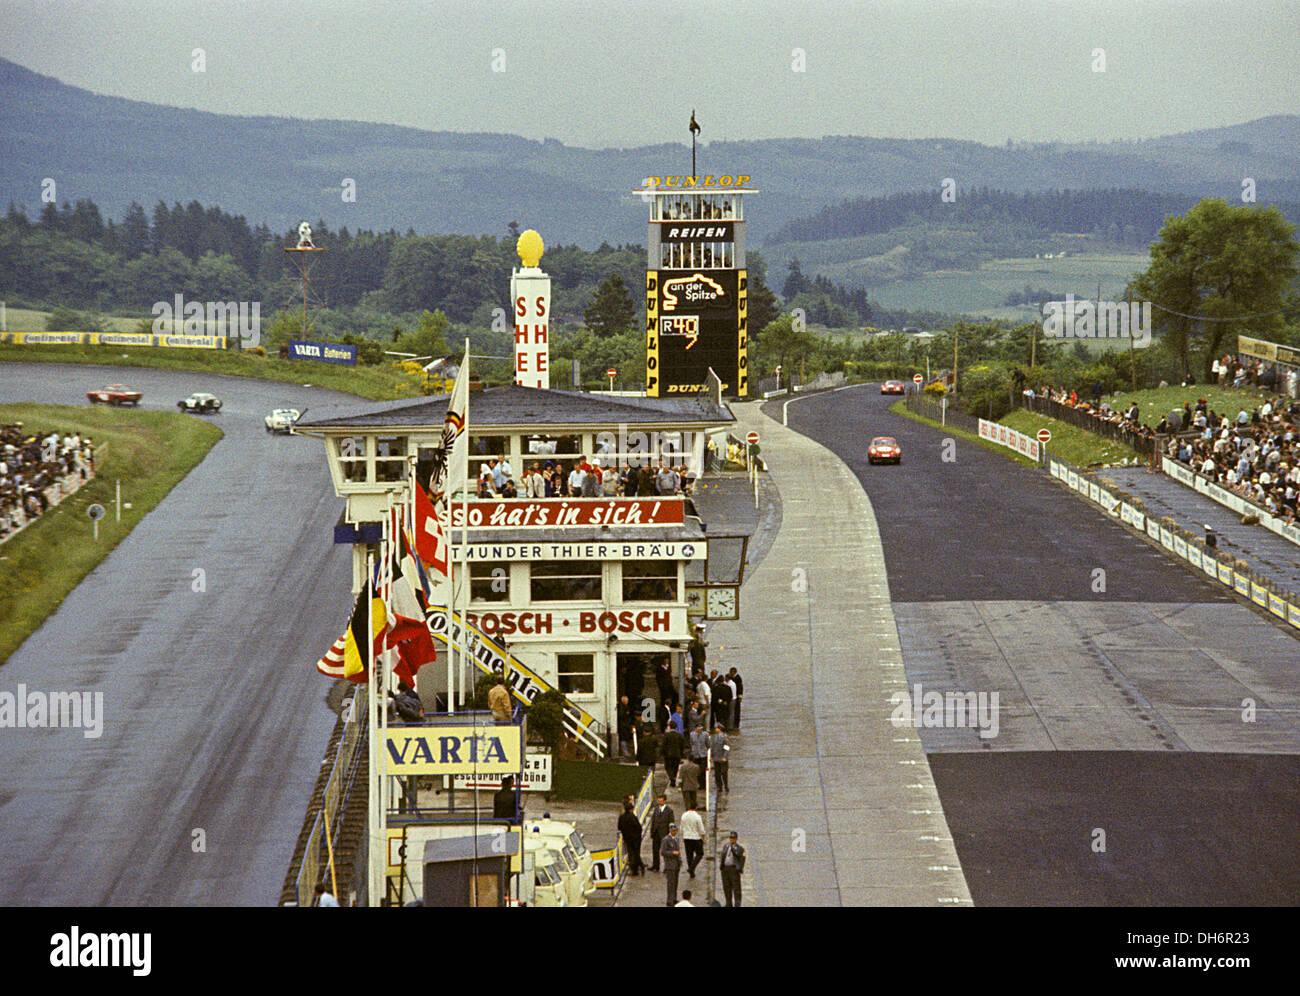 Ruta 12/04/2020 22:00 Nurburgring 1967 Nurburgring-pits-scoreboard-at-1000kms-race-meeting-germany-5-june-DH6R23